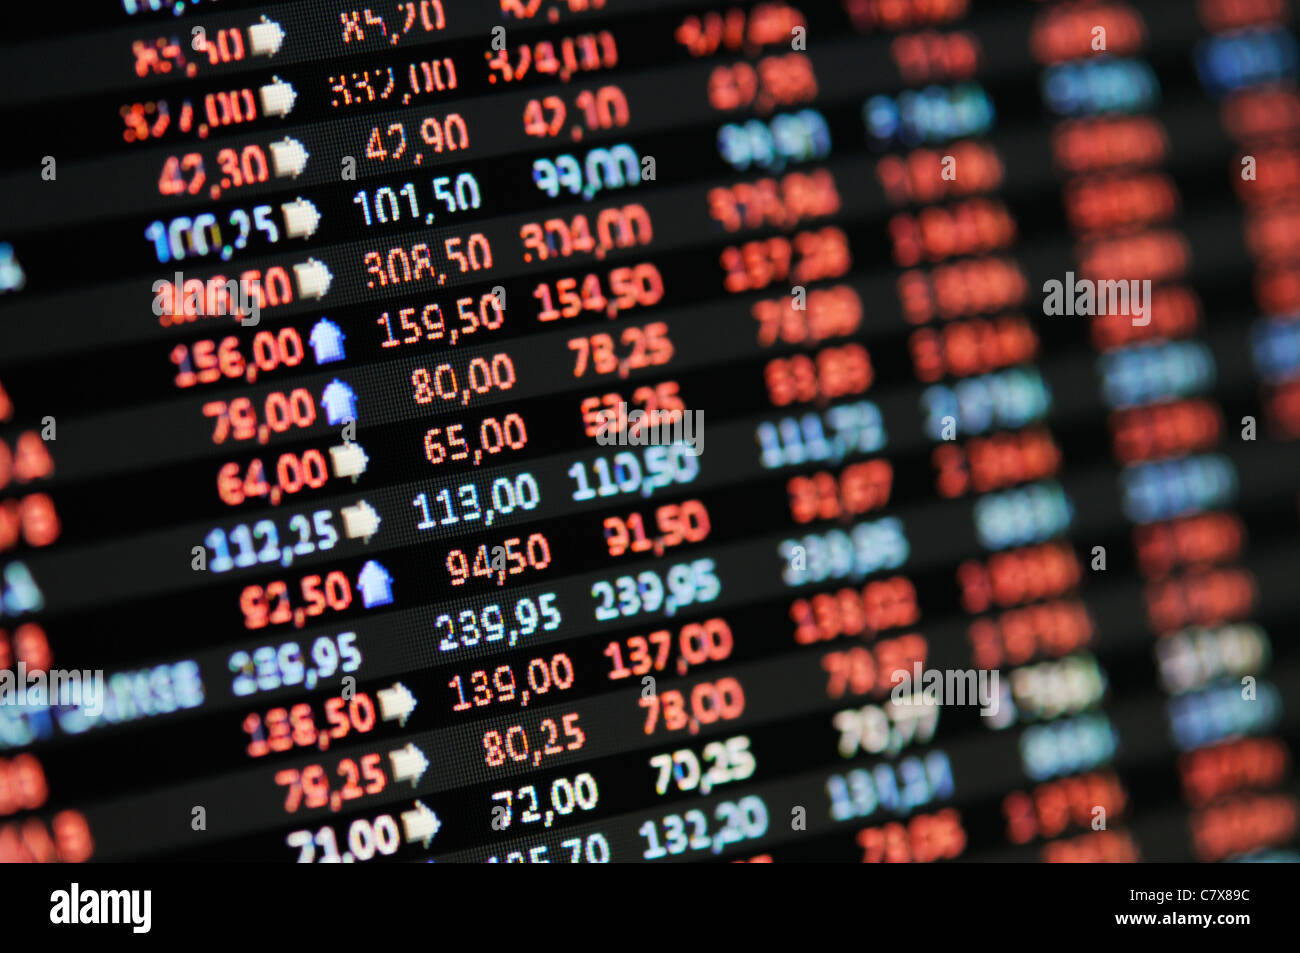 Stock Market Financial Trading Screen on LCD screen. Stock Photo